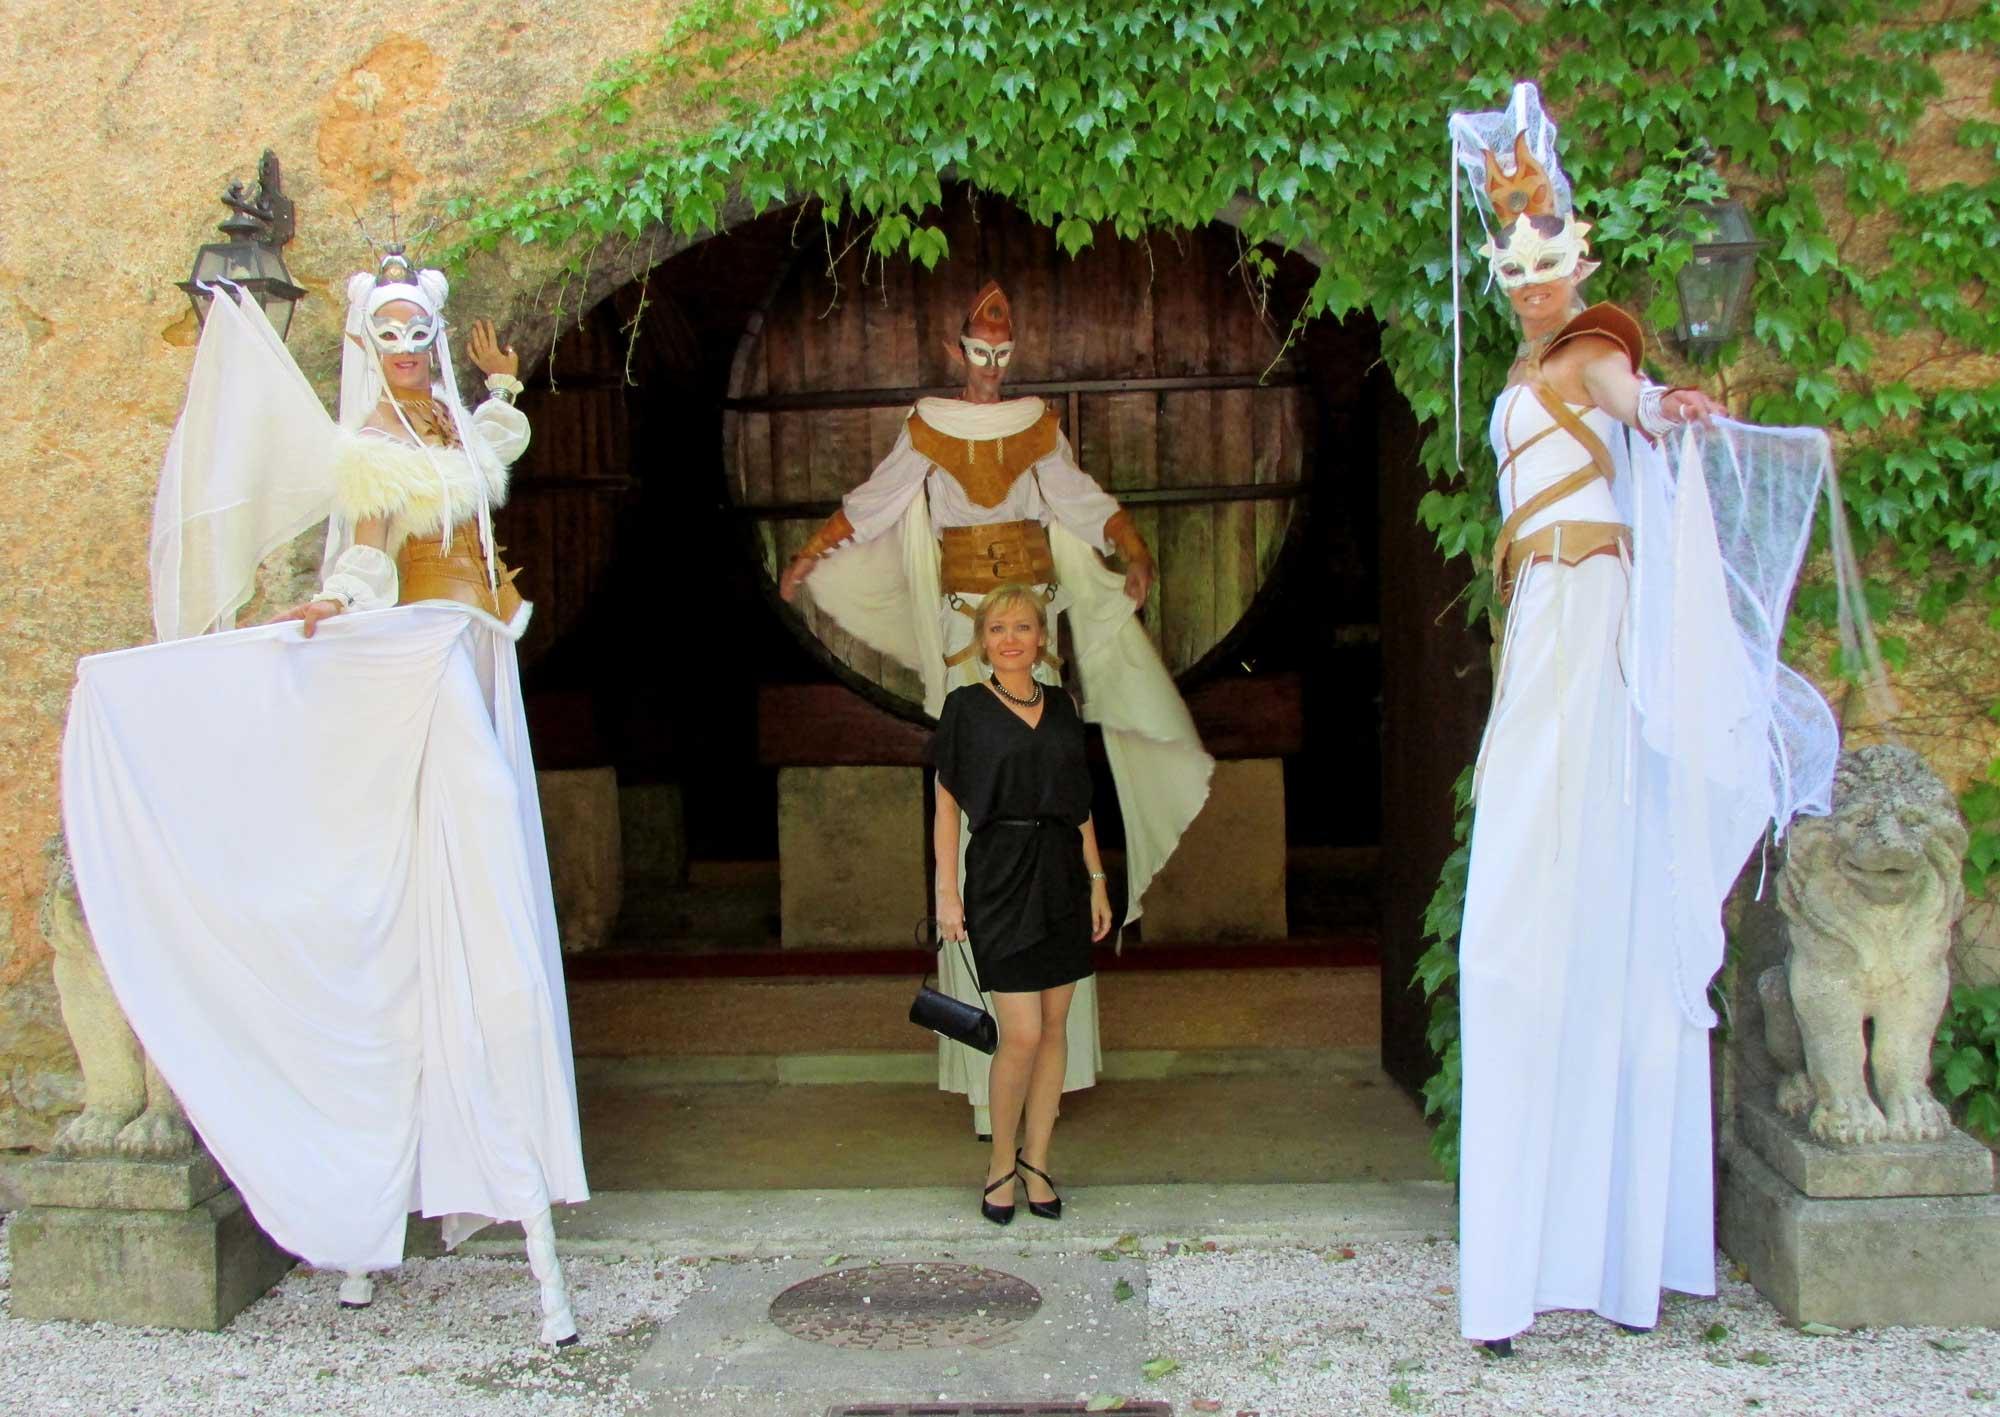 Montagnac-France-show-2016-artist-svetlana-leuchuk